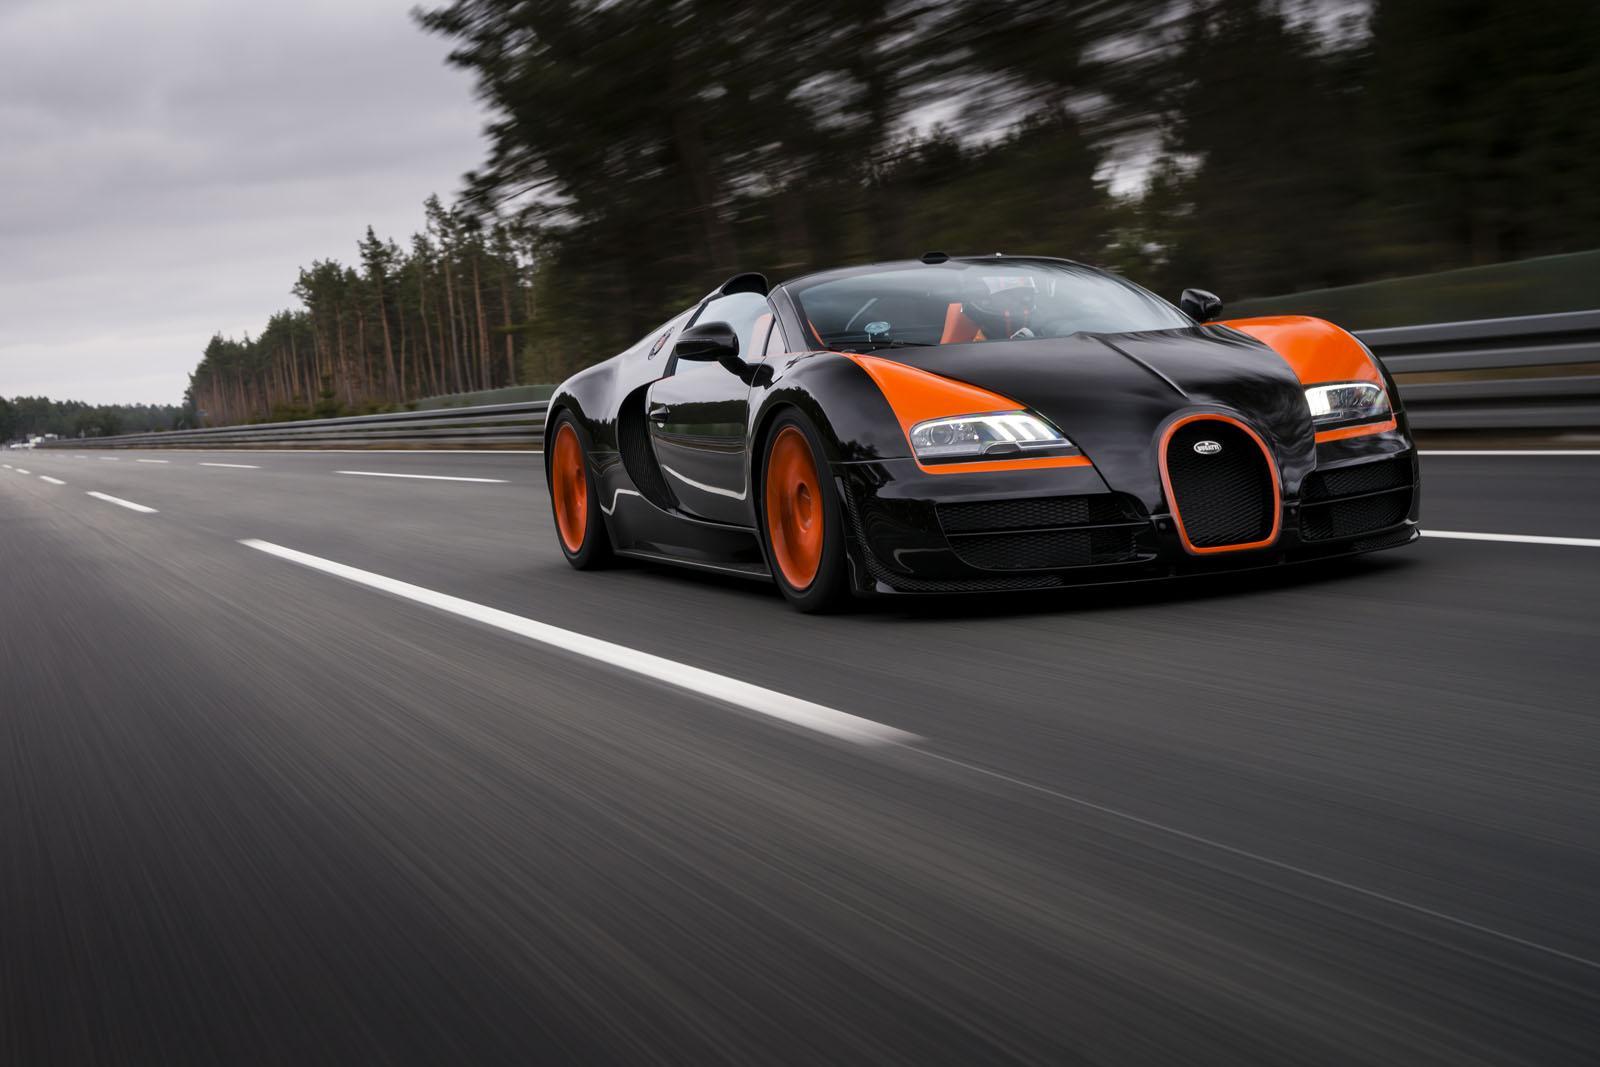 bugatti veyron grand sport vitesse is the world s fastest roadster autoevolution. Black Bedroom Furniture Sets. Home Design Ideas